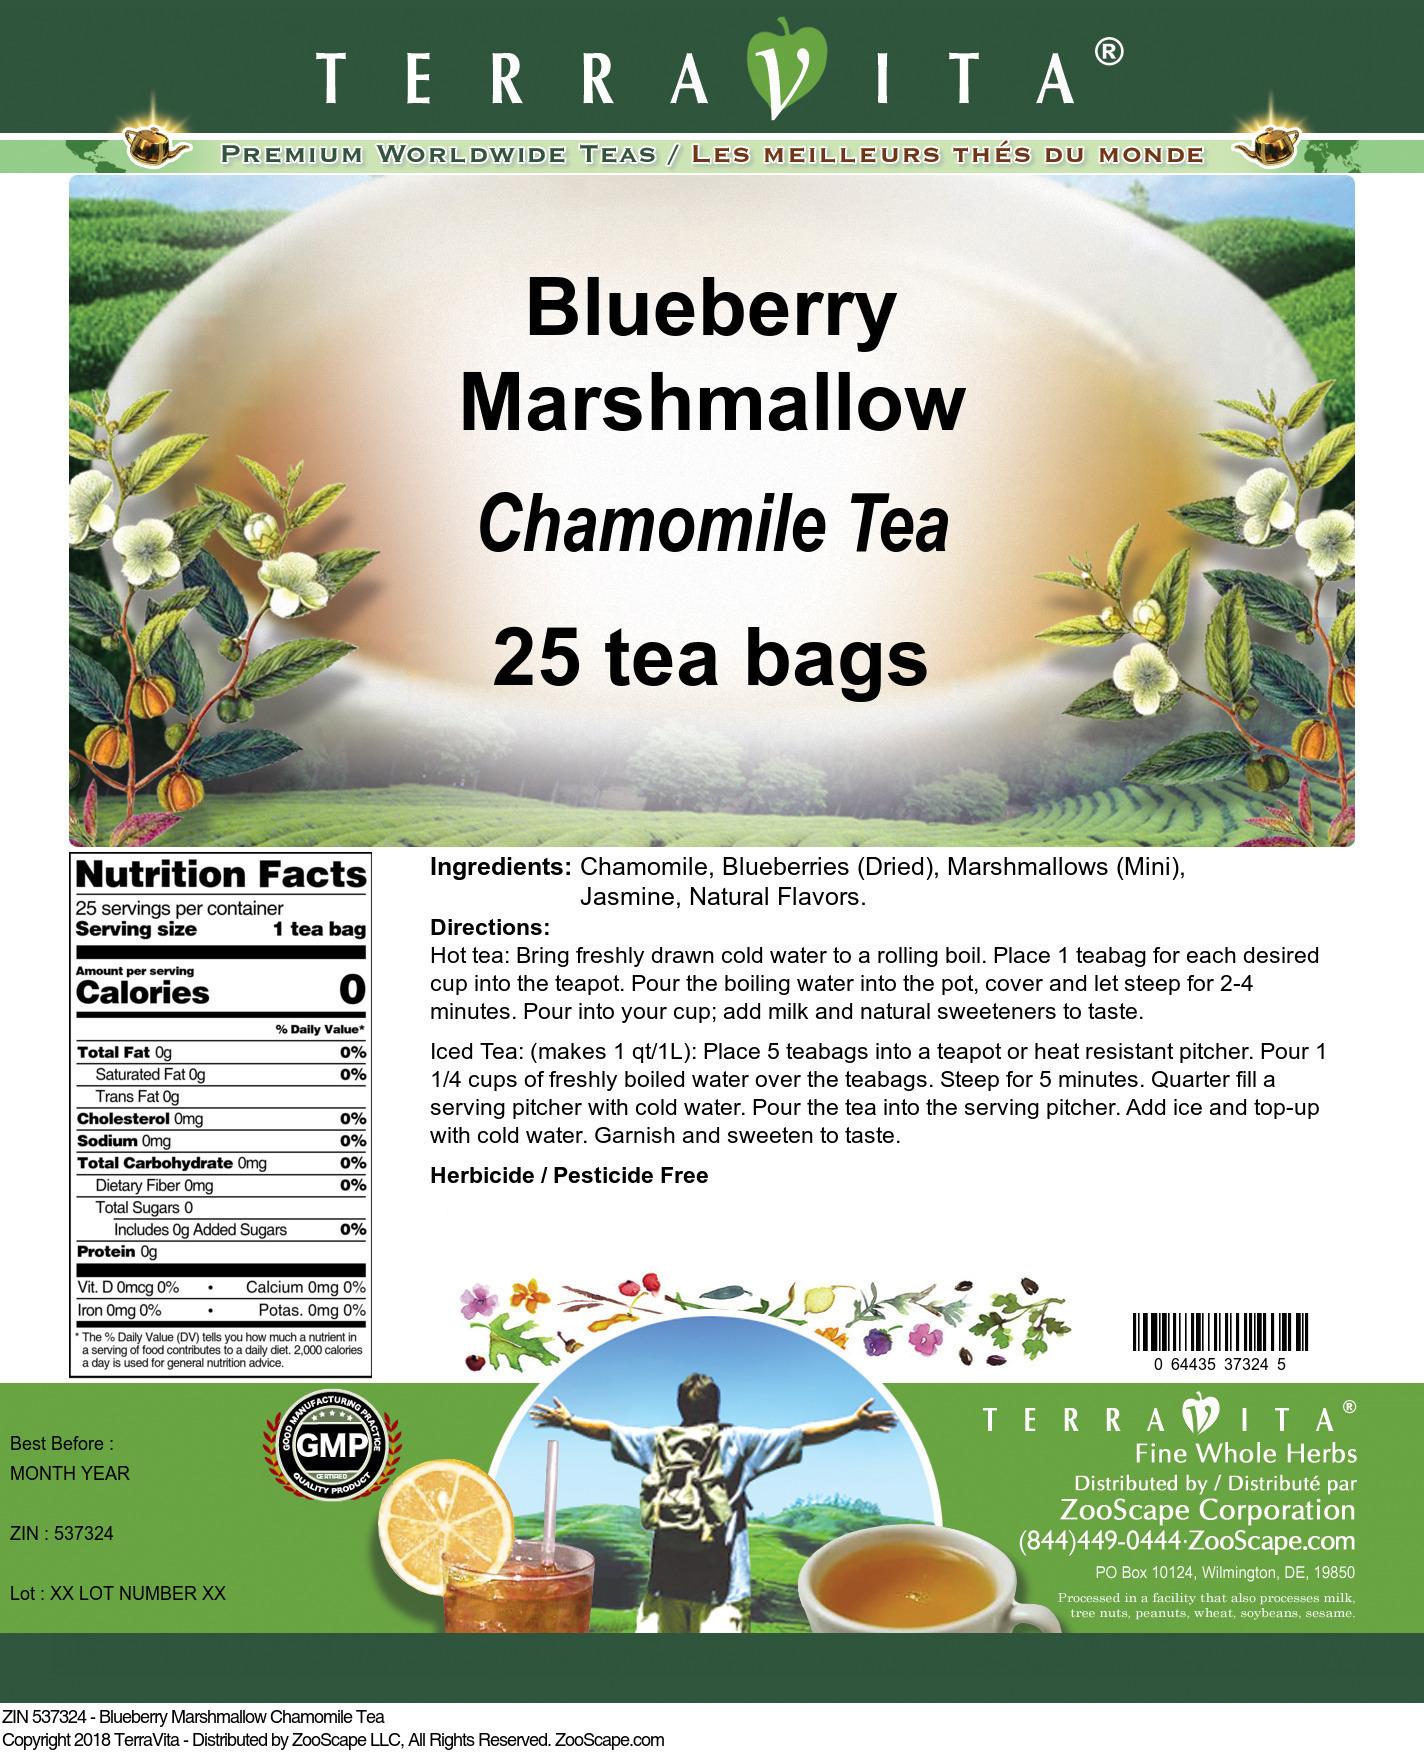 Blueberry Marshmallow Chamomile Tea